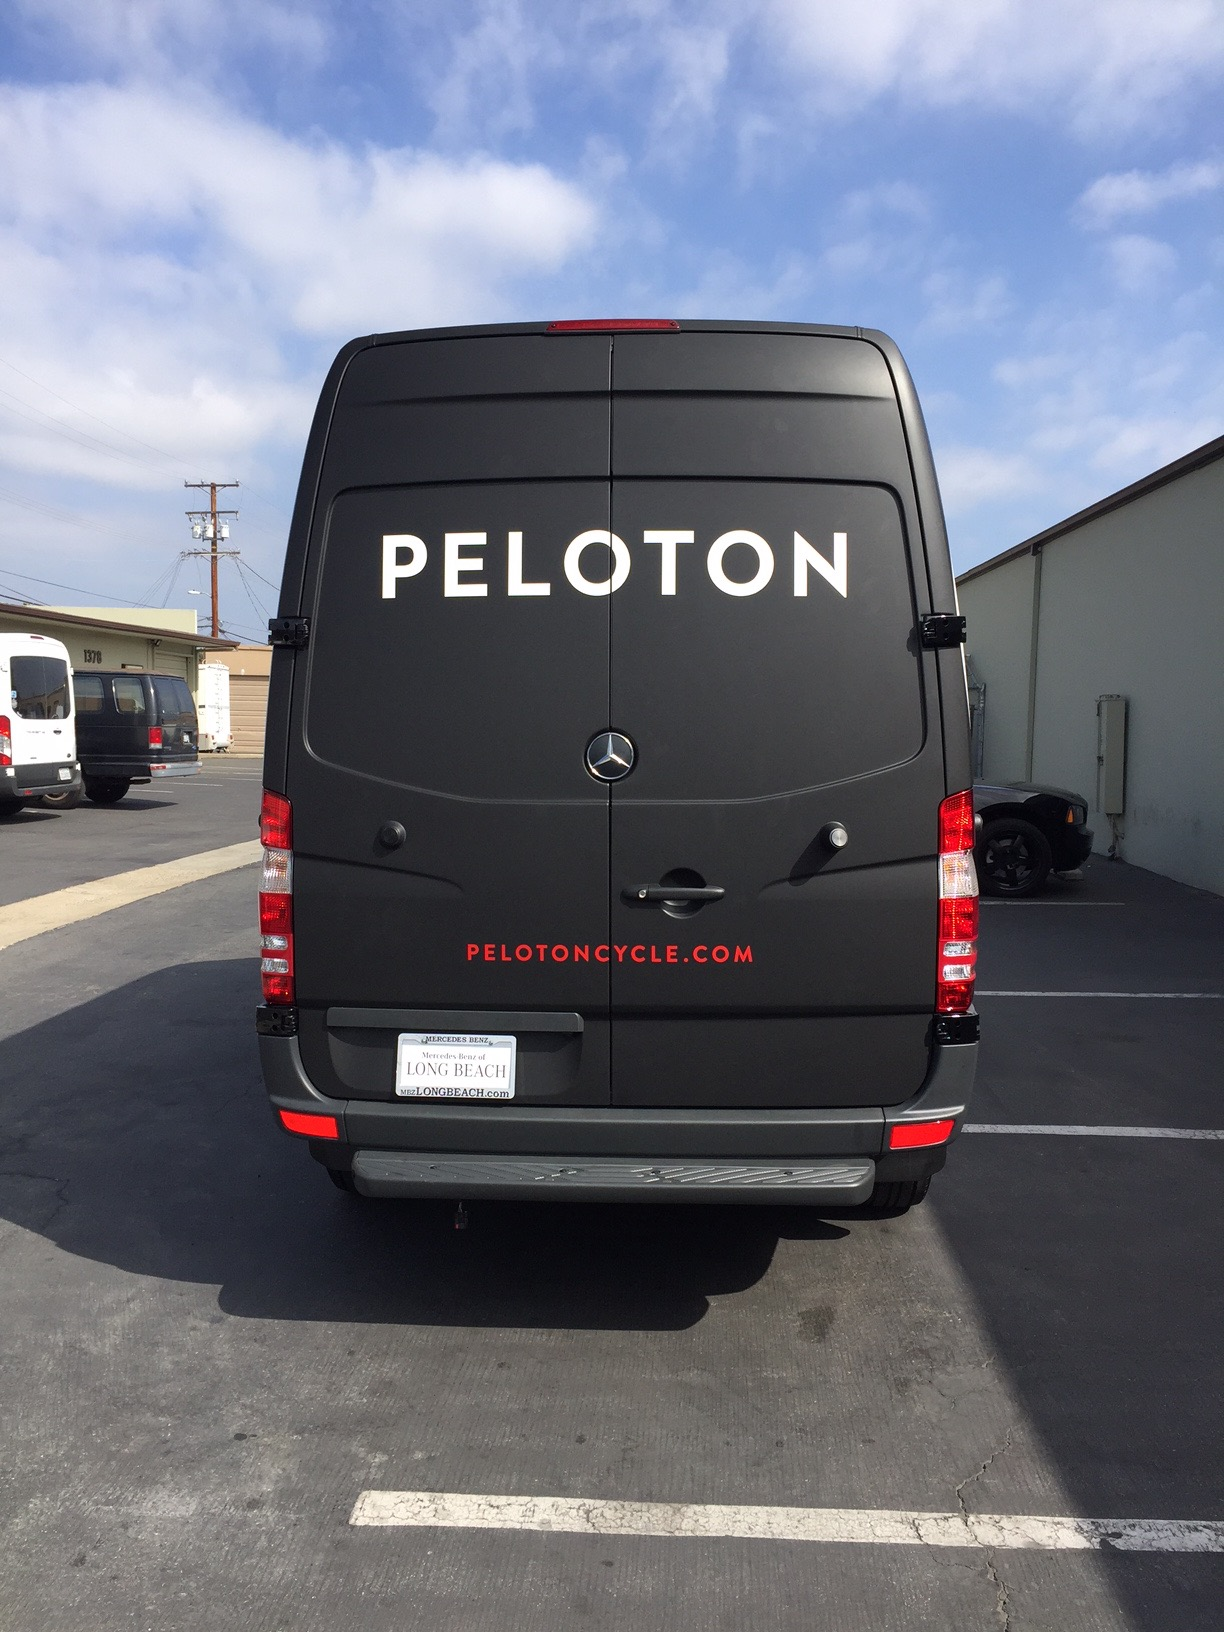 fleet wraps, fleet graphics, car wraps